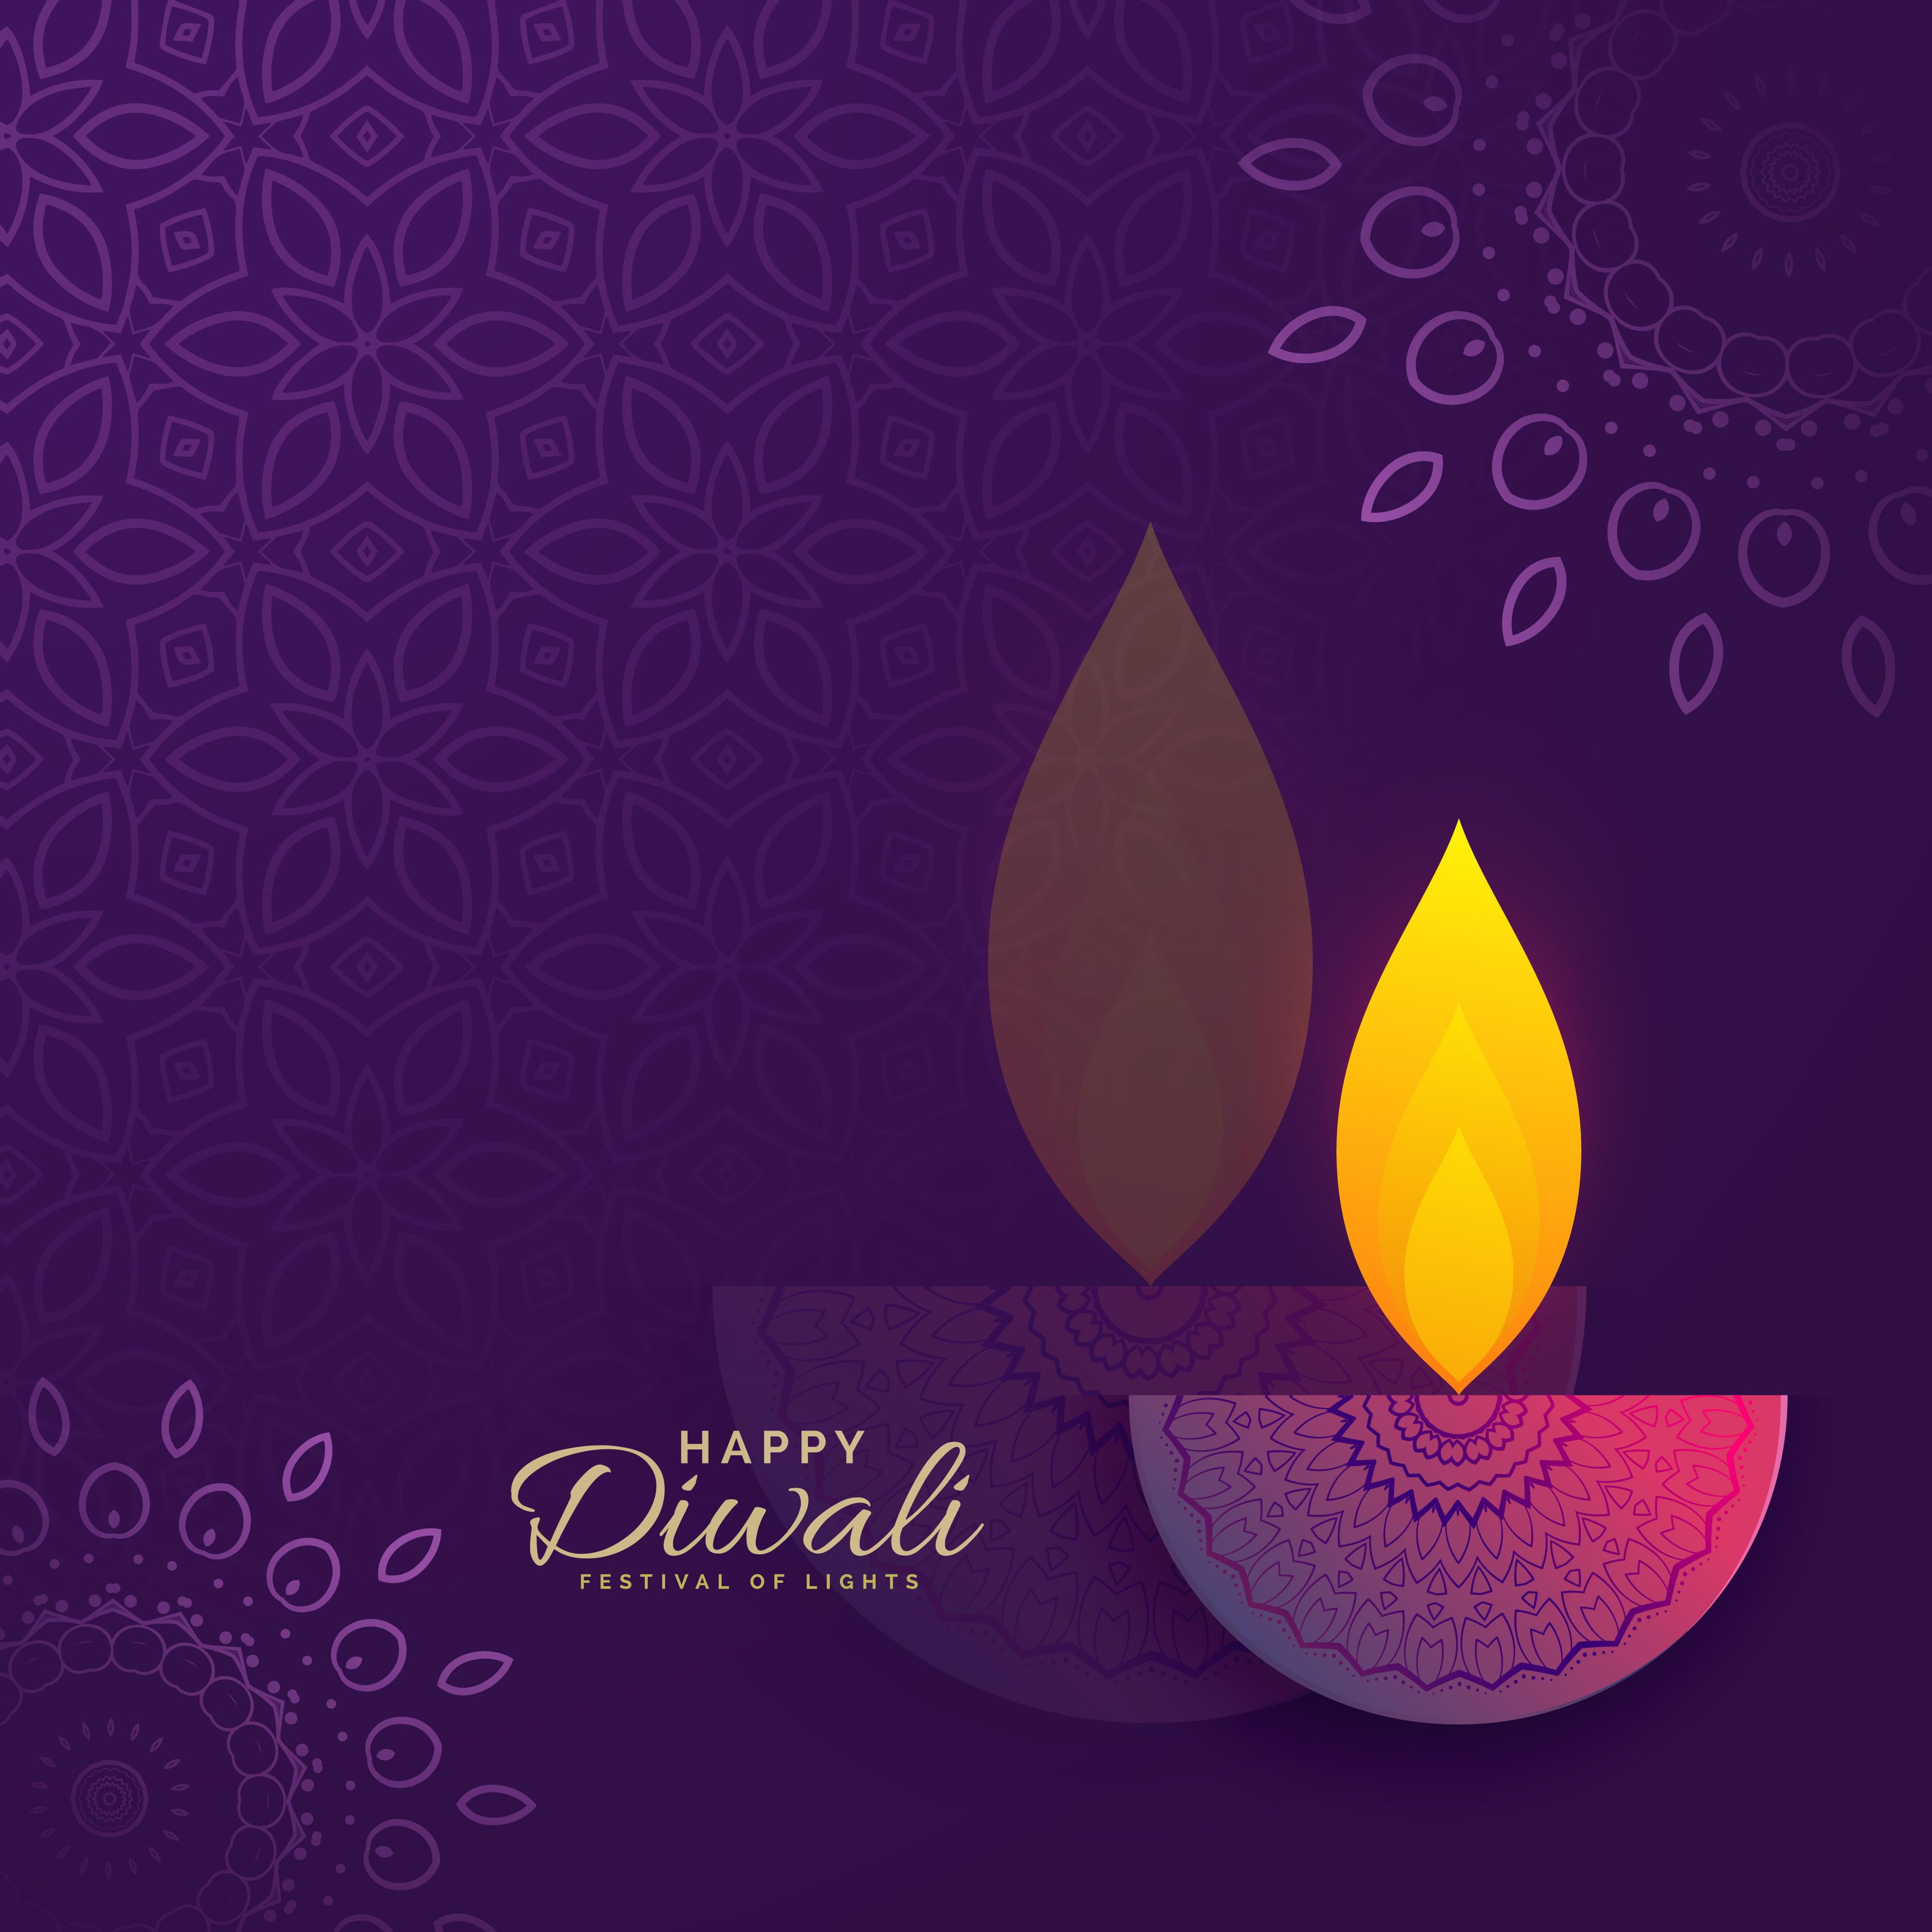 diwali greeting card design with creative diya and